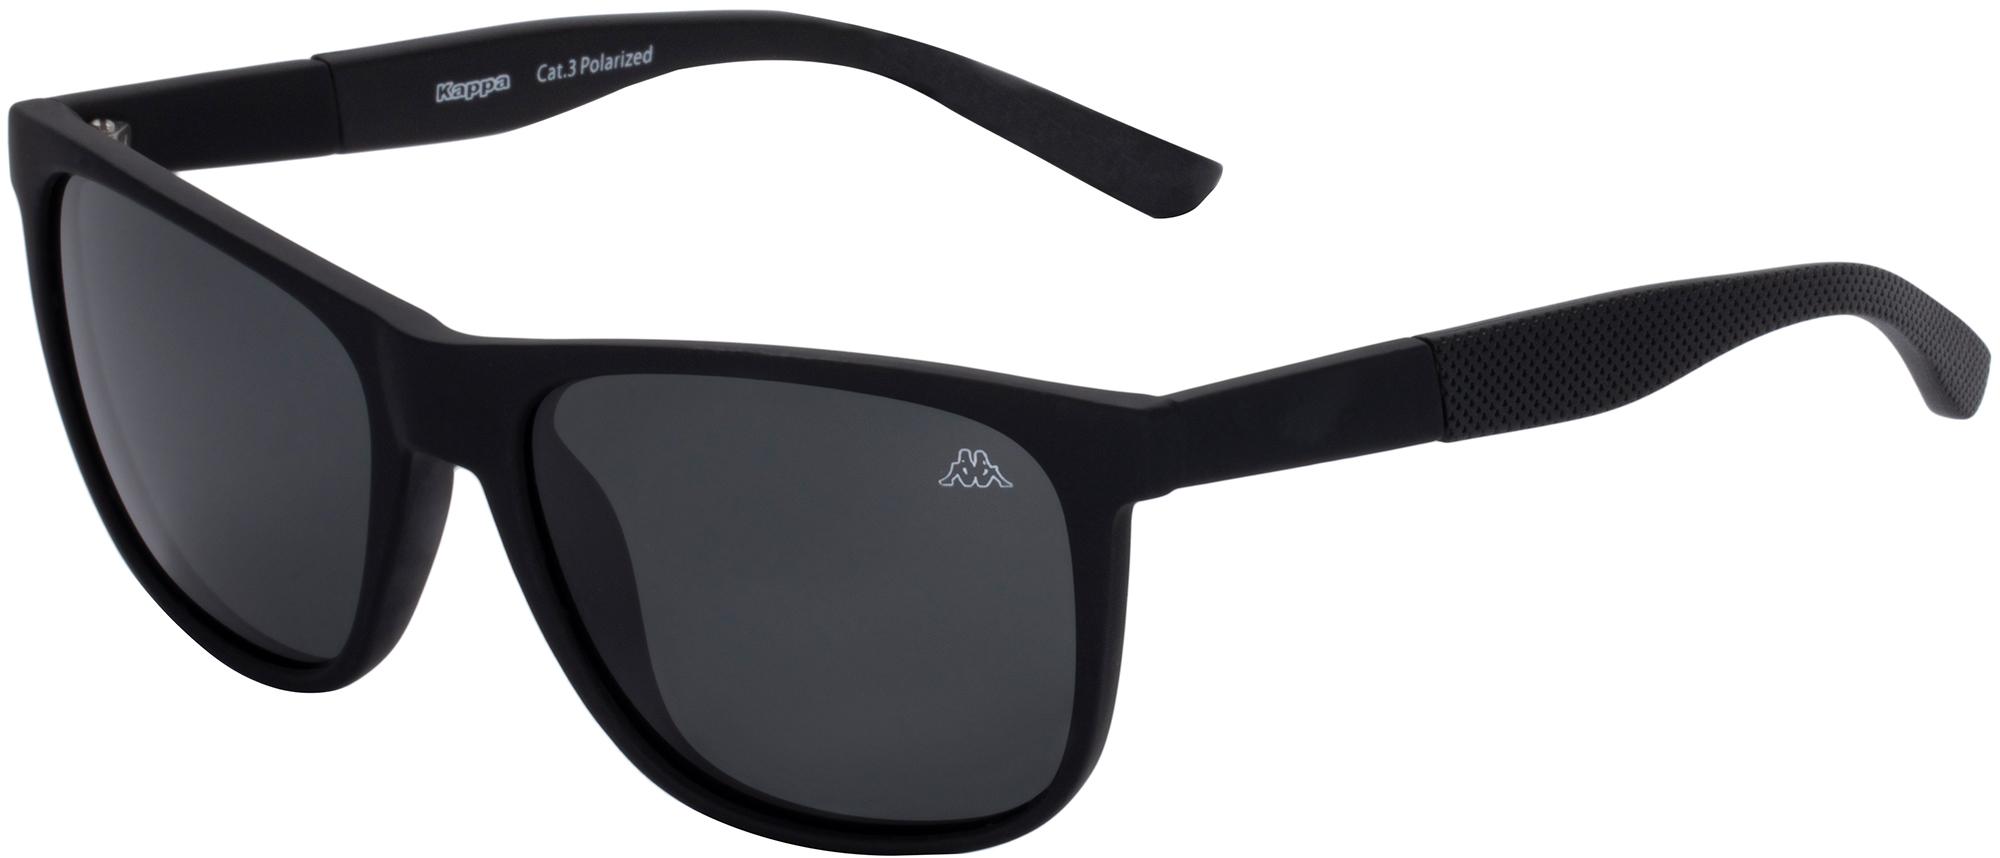 Kappa Солнцезащитные очки Kappa цена 2017